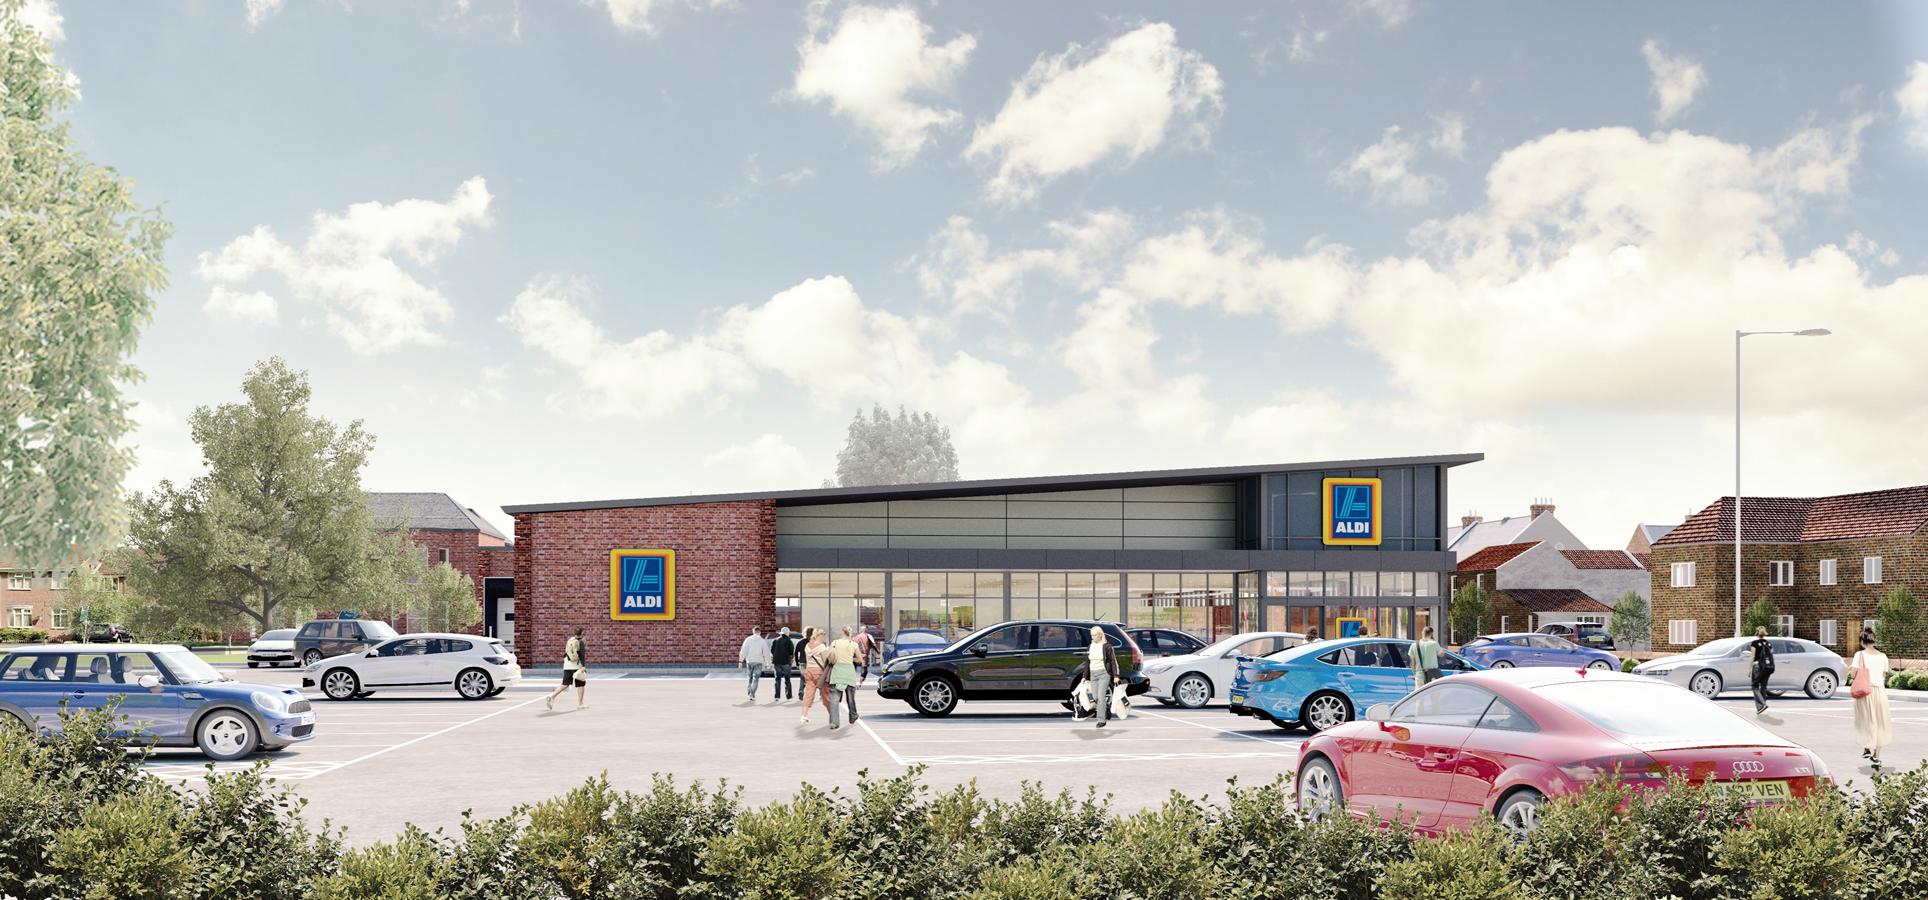 Jessops Completes in Hull , Jessops Construction Ltd